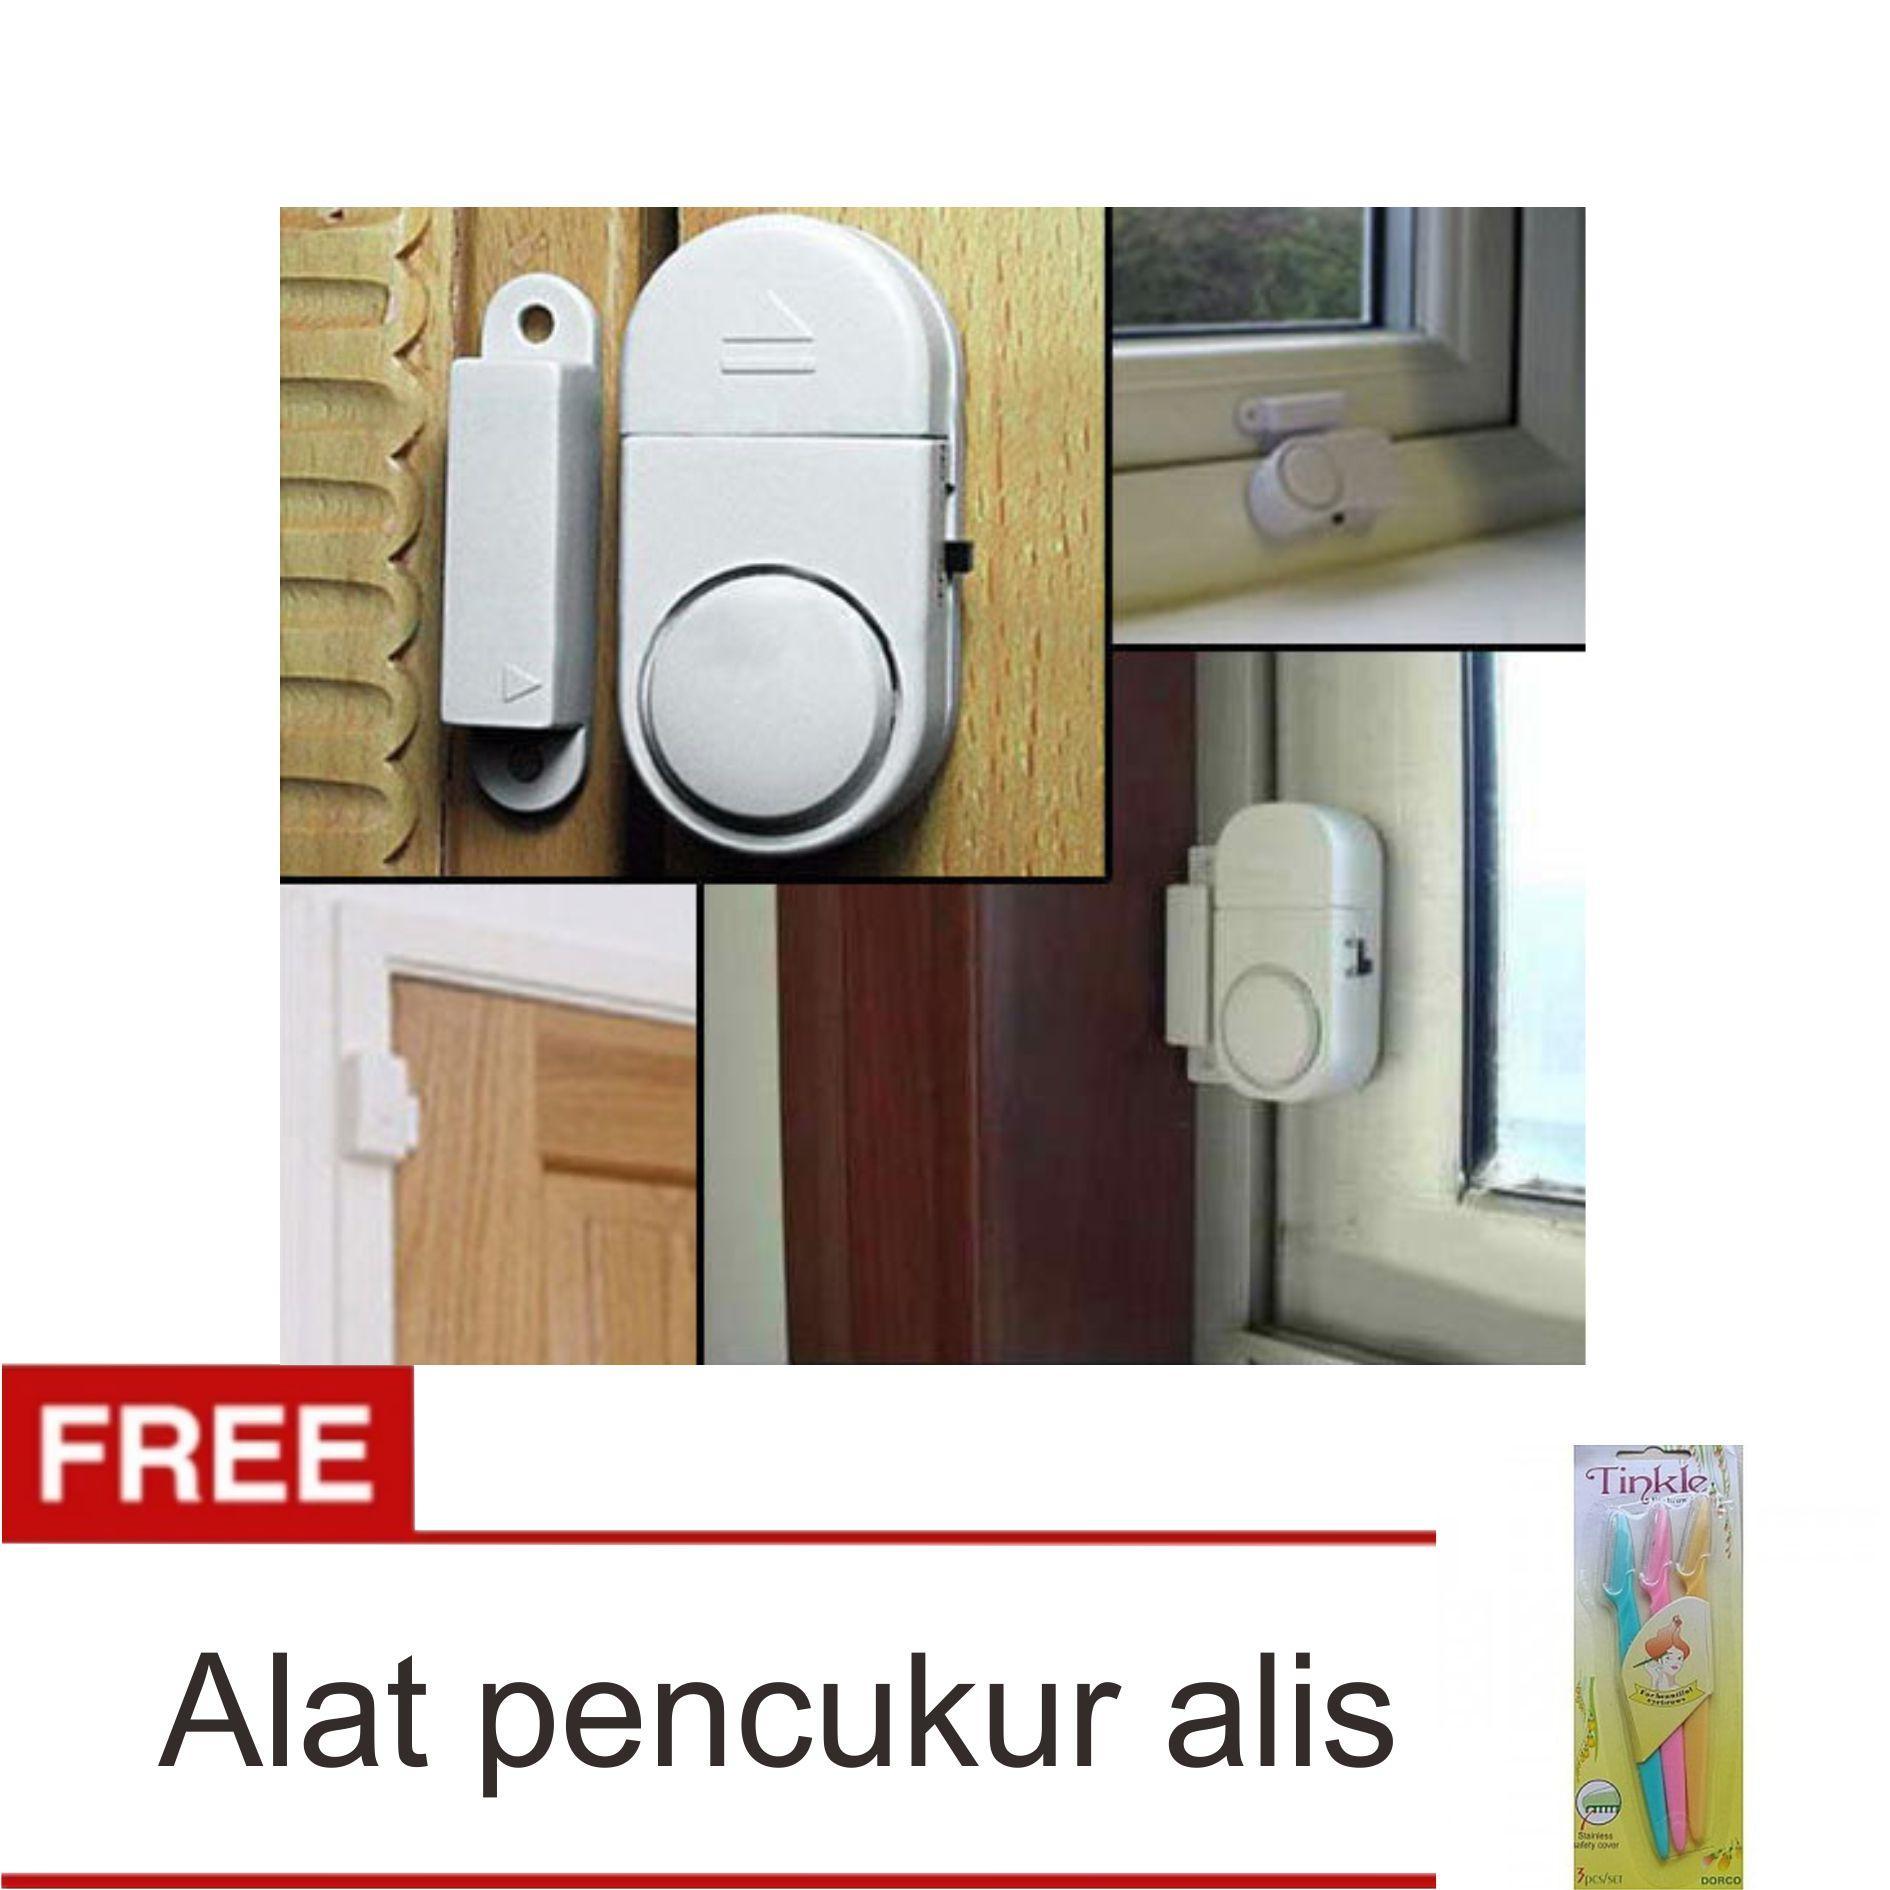 lanjar jaya Alarm Pintu Jendela Rumah Anti Maling - Door Window Entry Alarm + Pencukur Alis